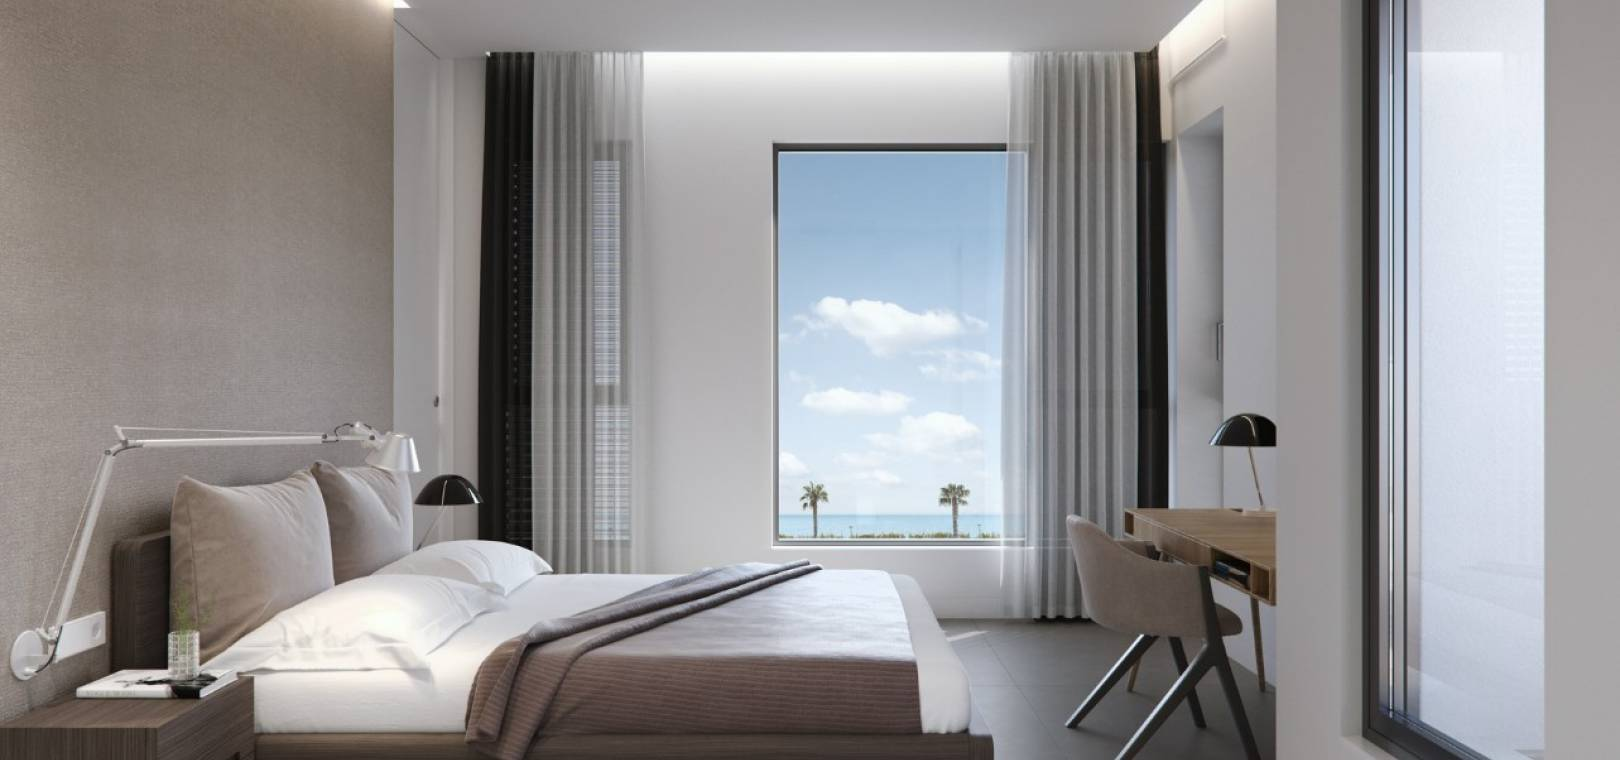 Torre_de_la_Horadada_New_Build_Luxury_Houses_For_Sale_nsp256_14